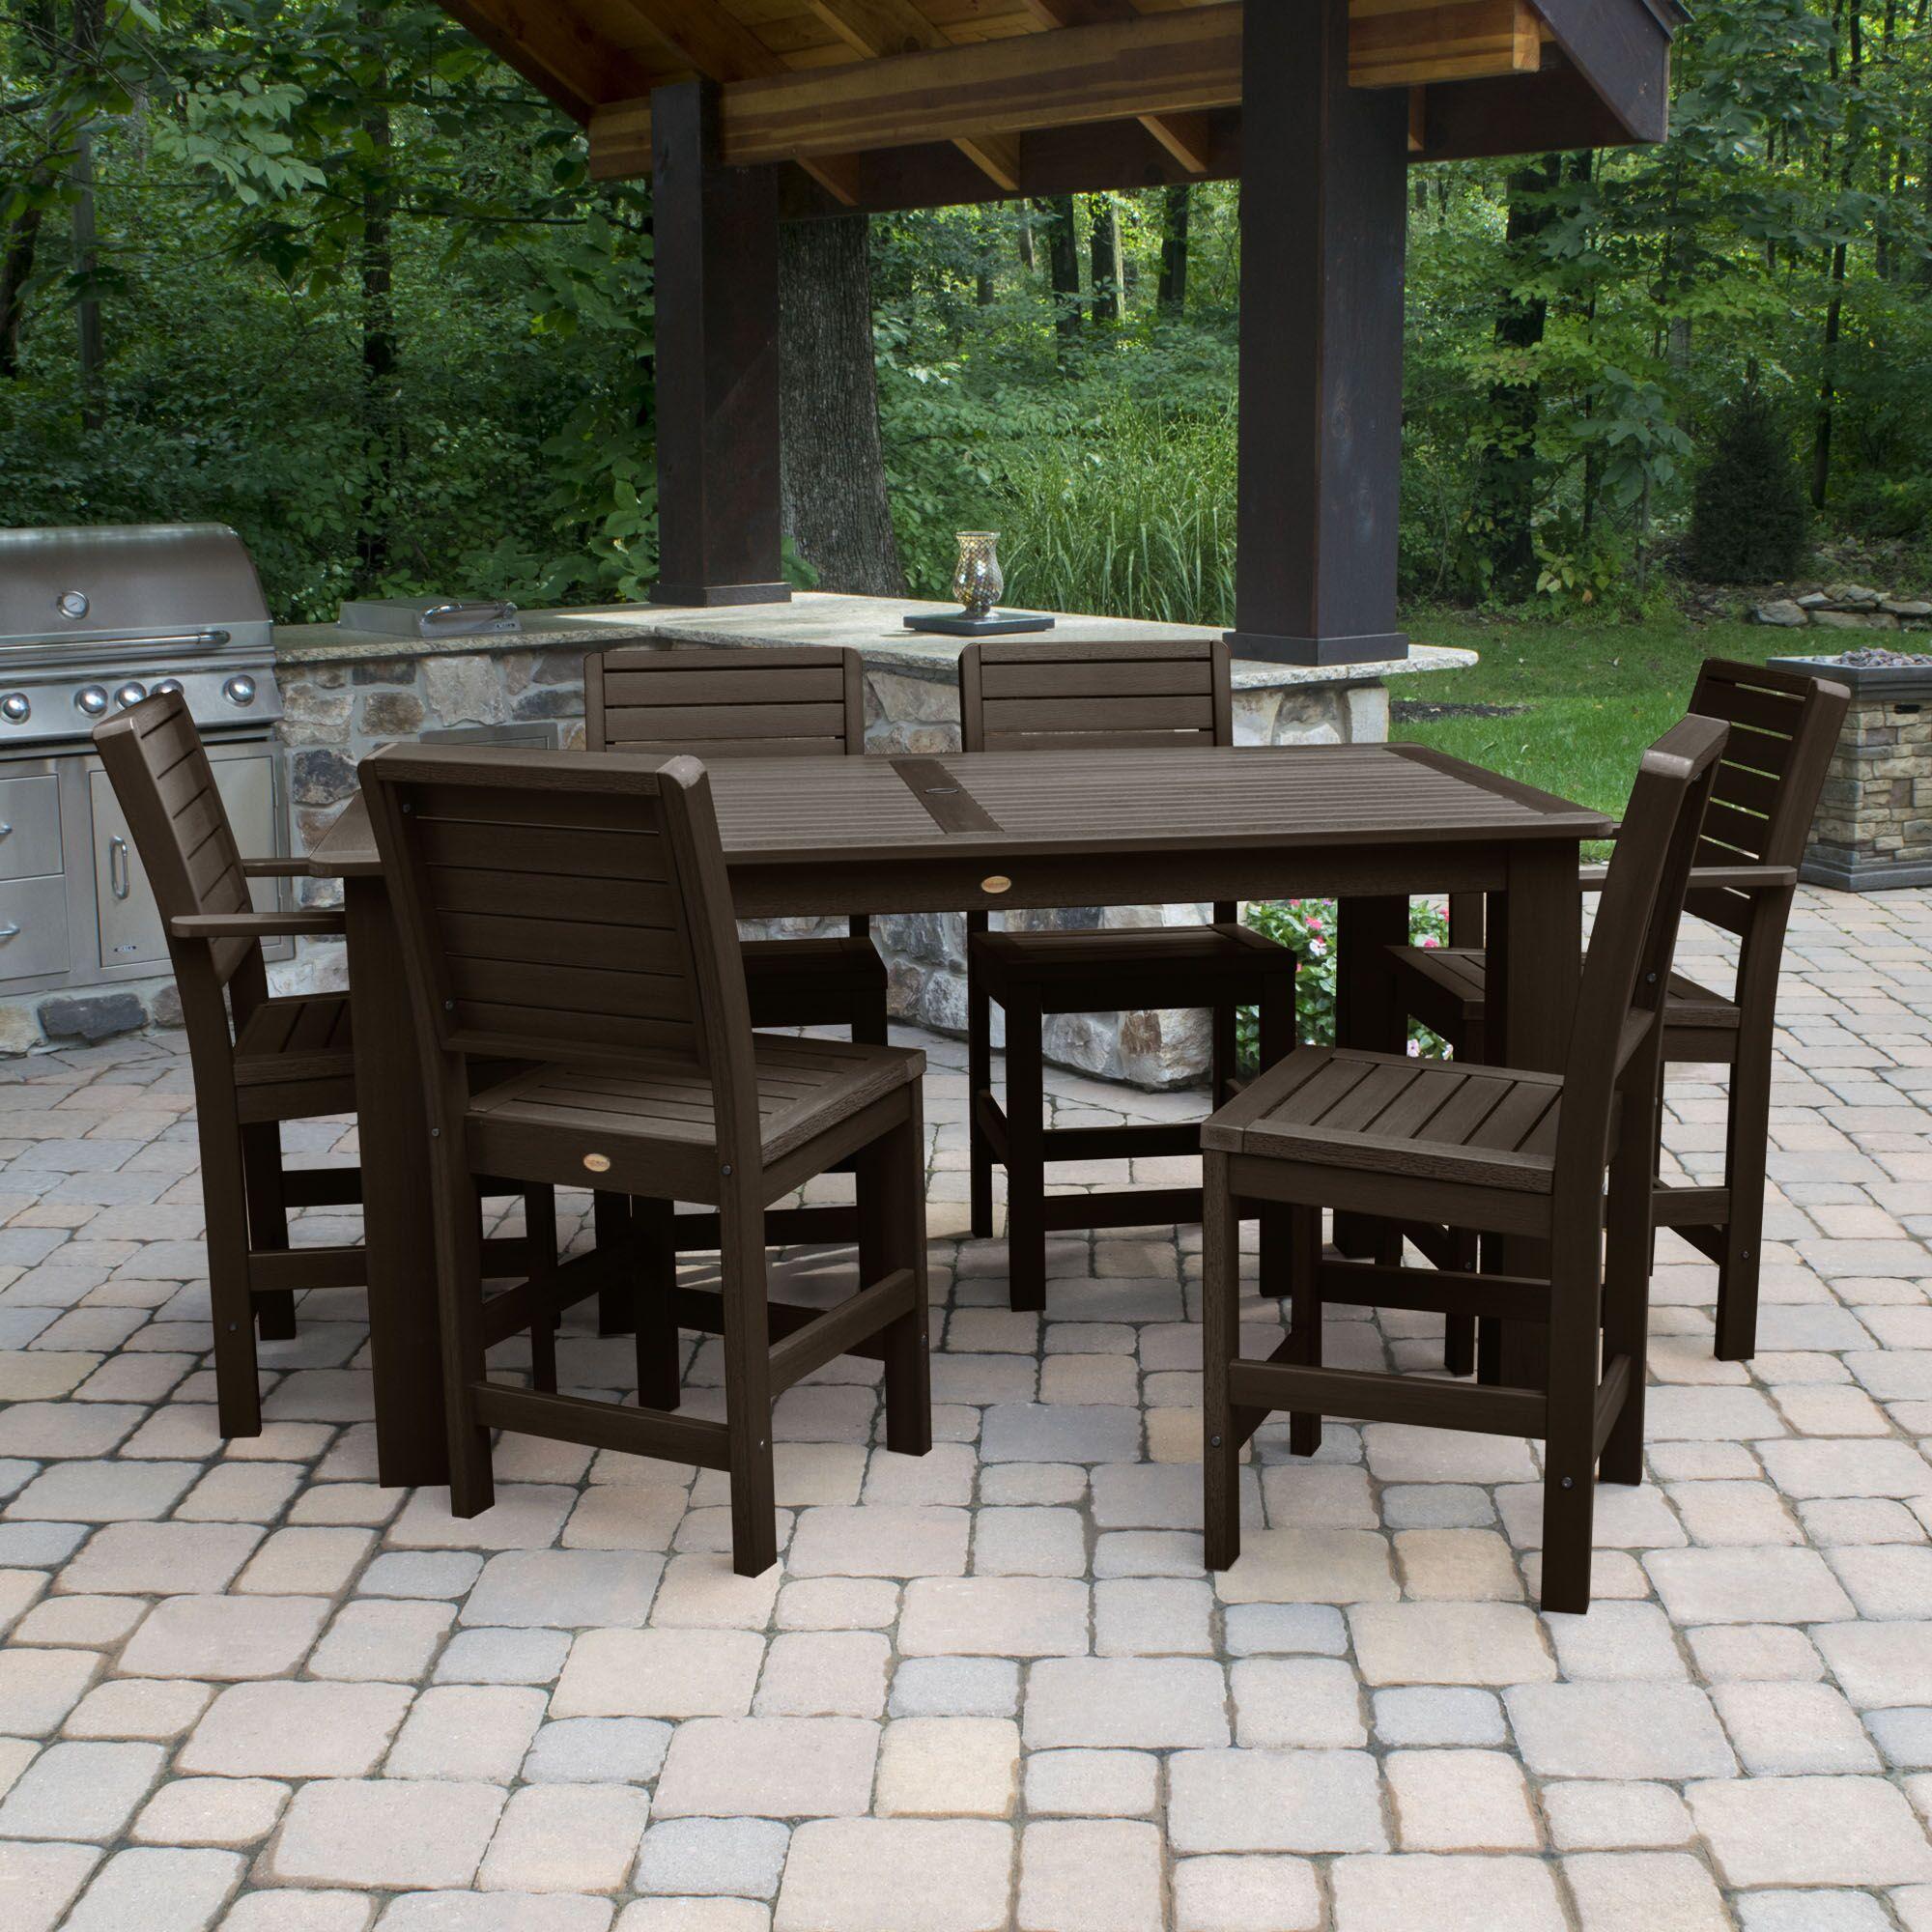 Shondra 7 Piece Rectangular Counter Height Dining Set Color: Weathered Acorn, Table Top Size: 43.3